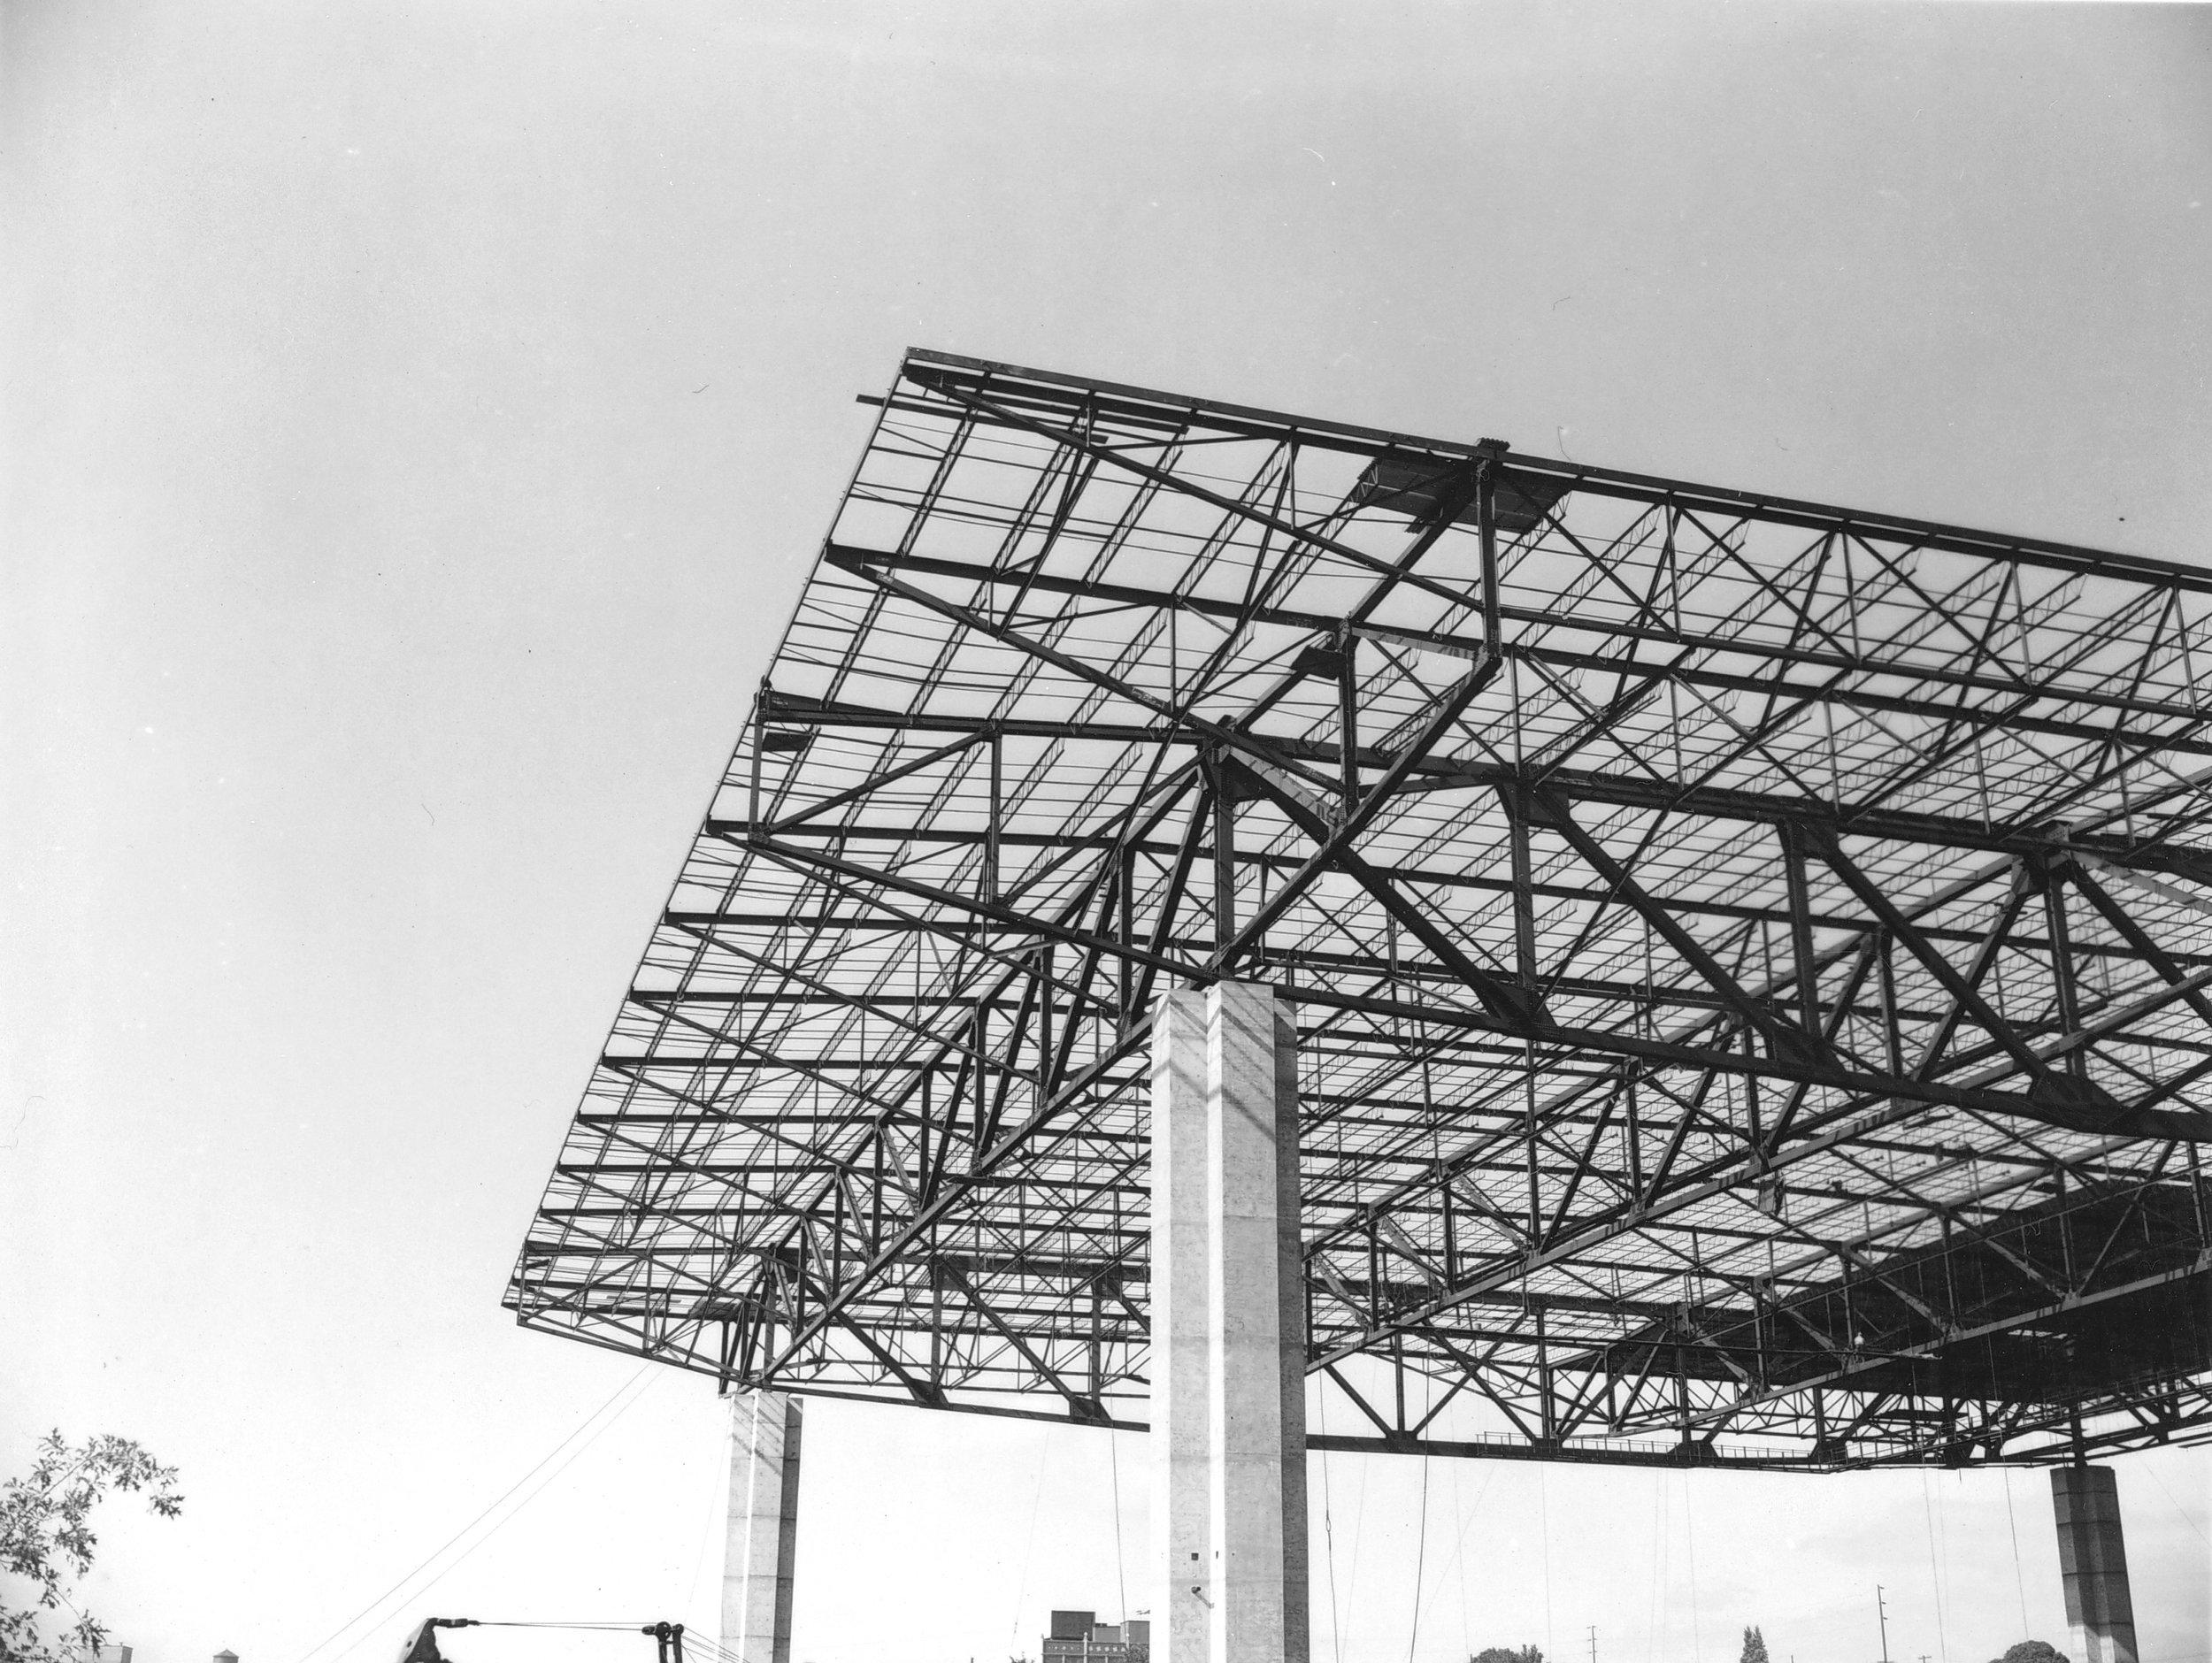 Veterans_Memorial_Coliseum_construction_(3) (1).JPG